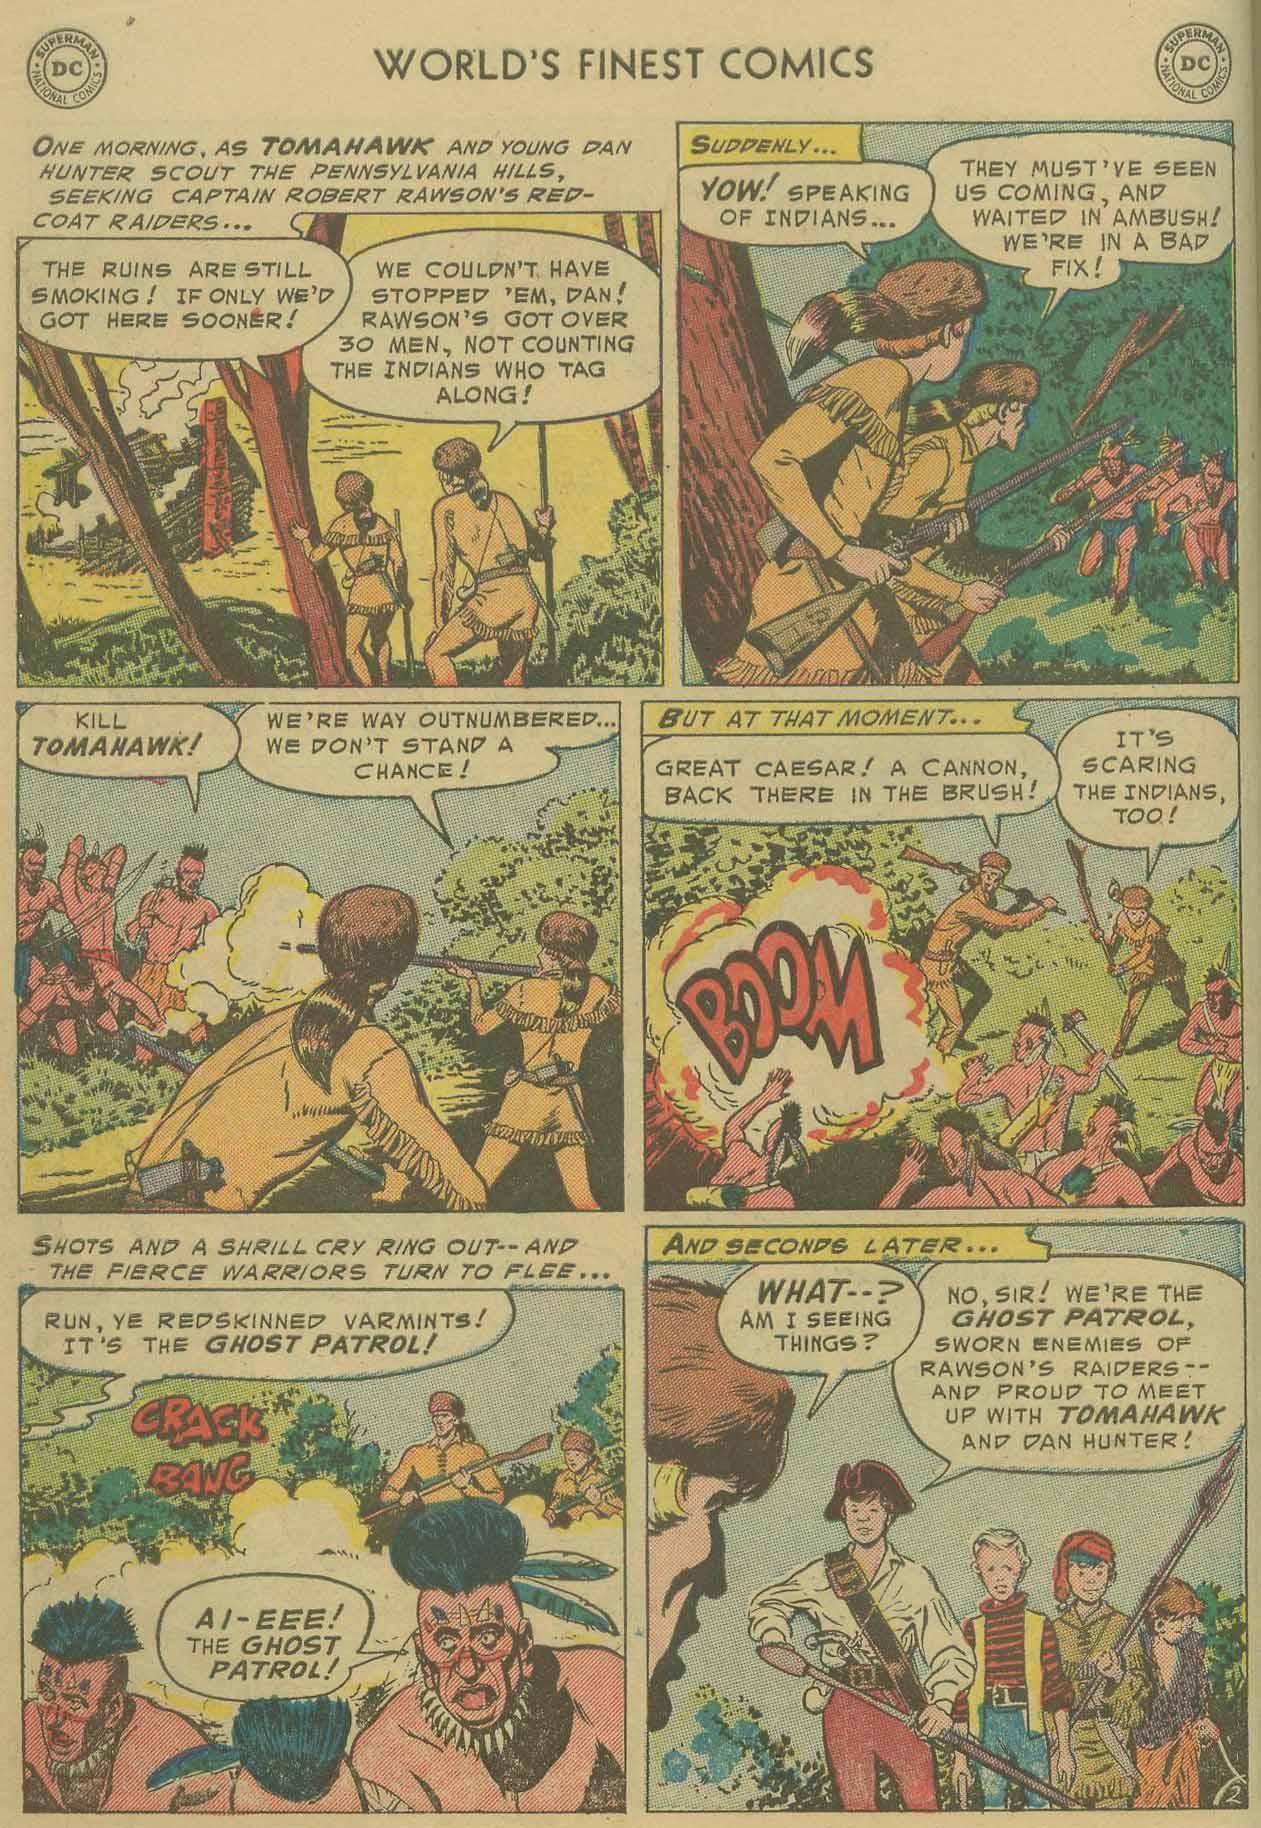 Read online World's Finest Comics comic -  Issue #69 - 18